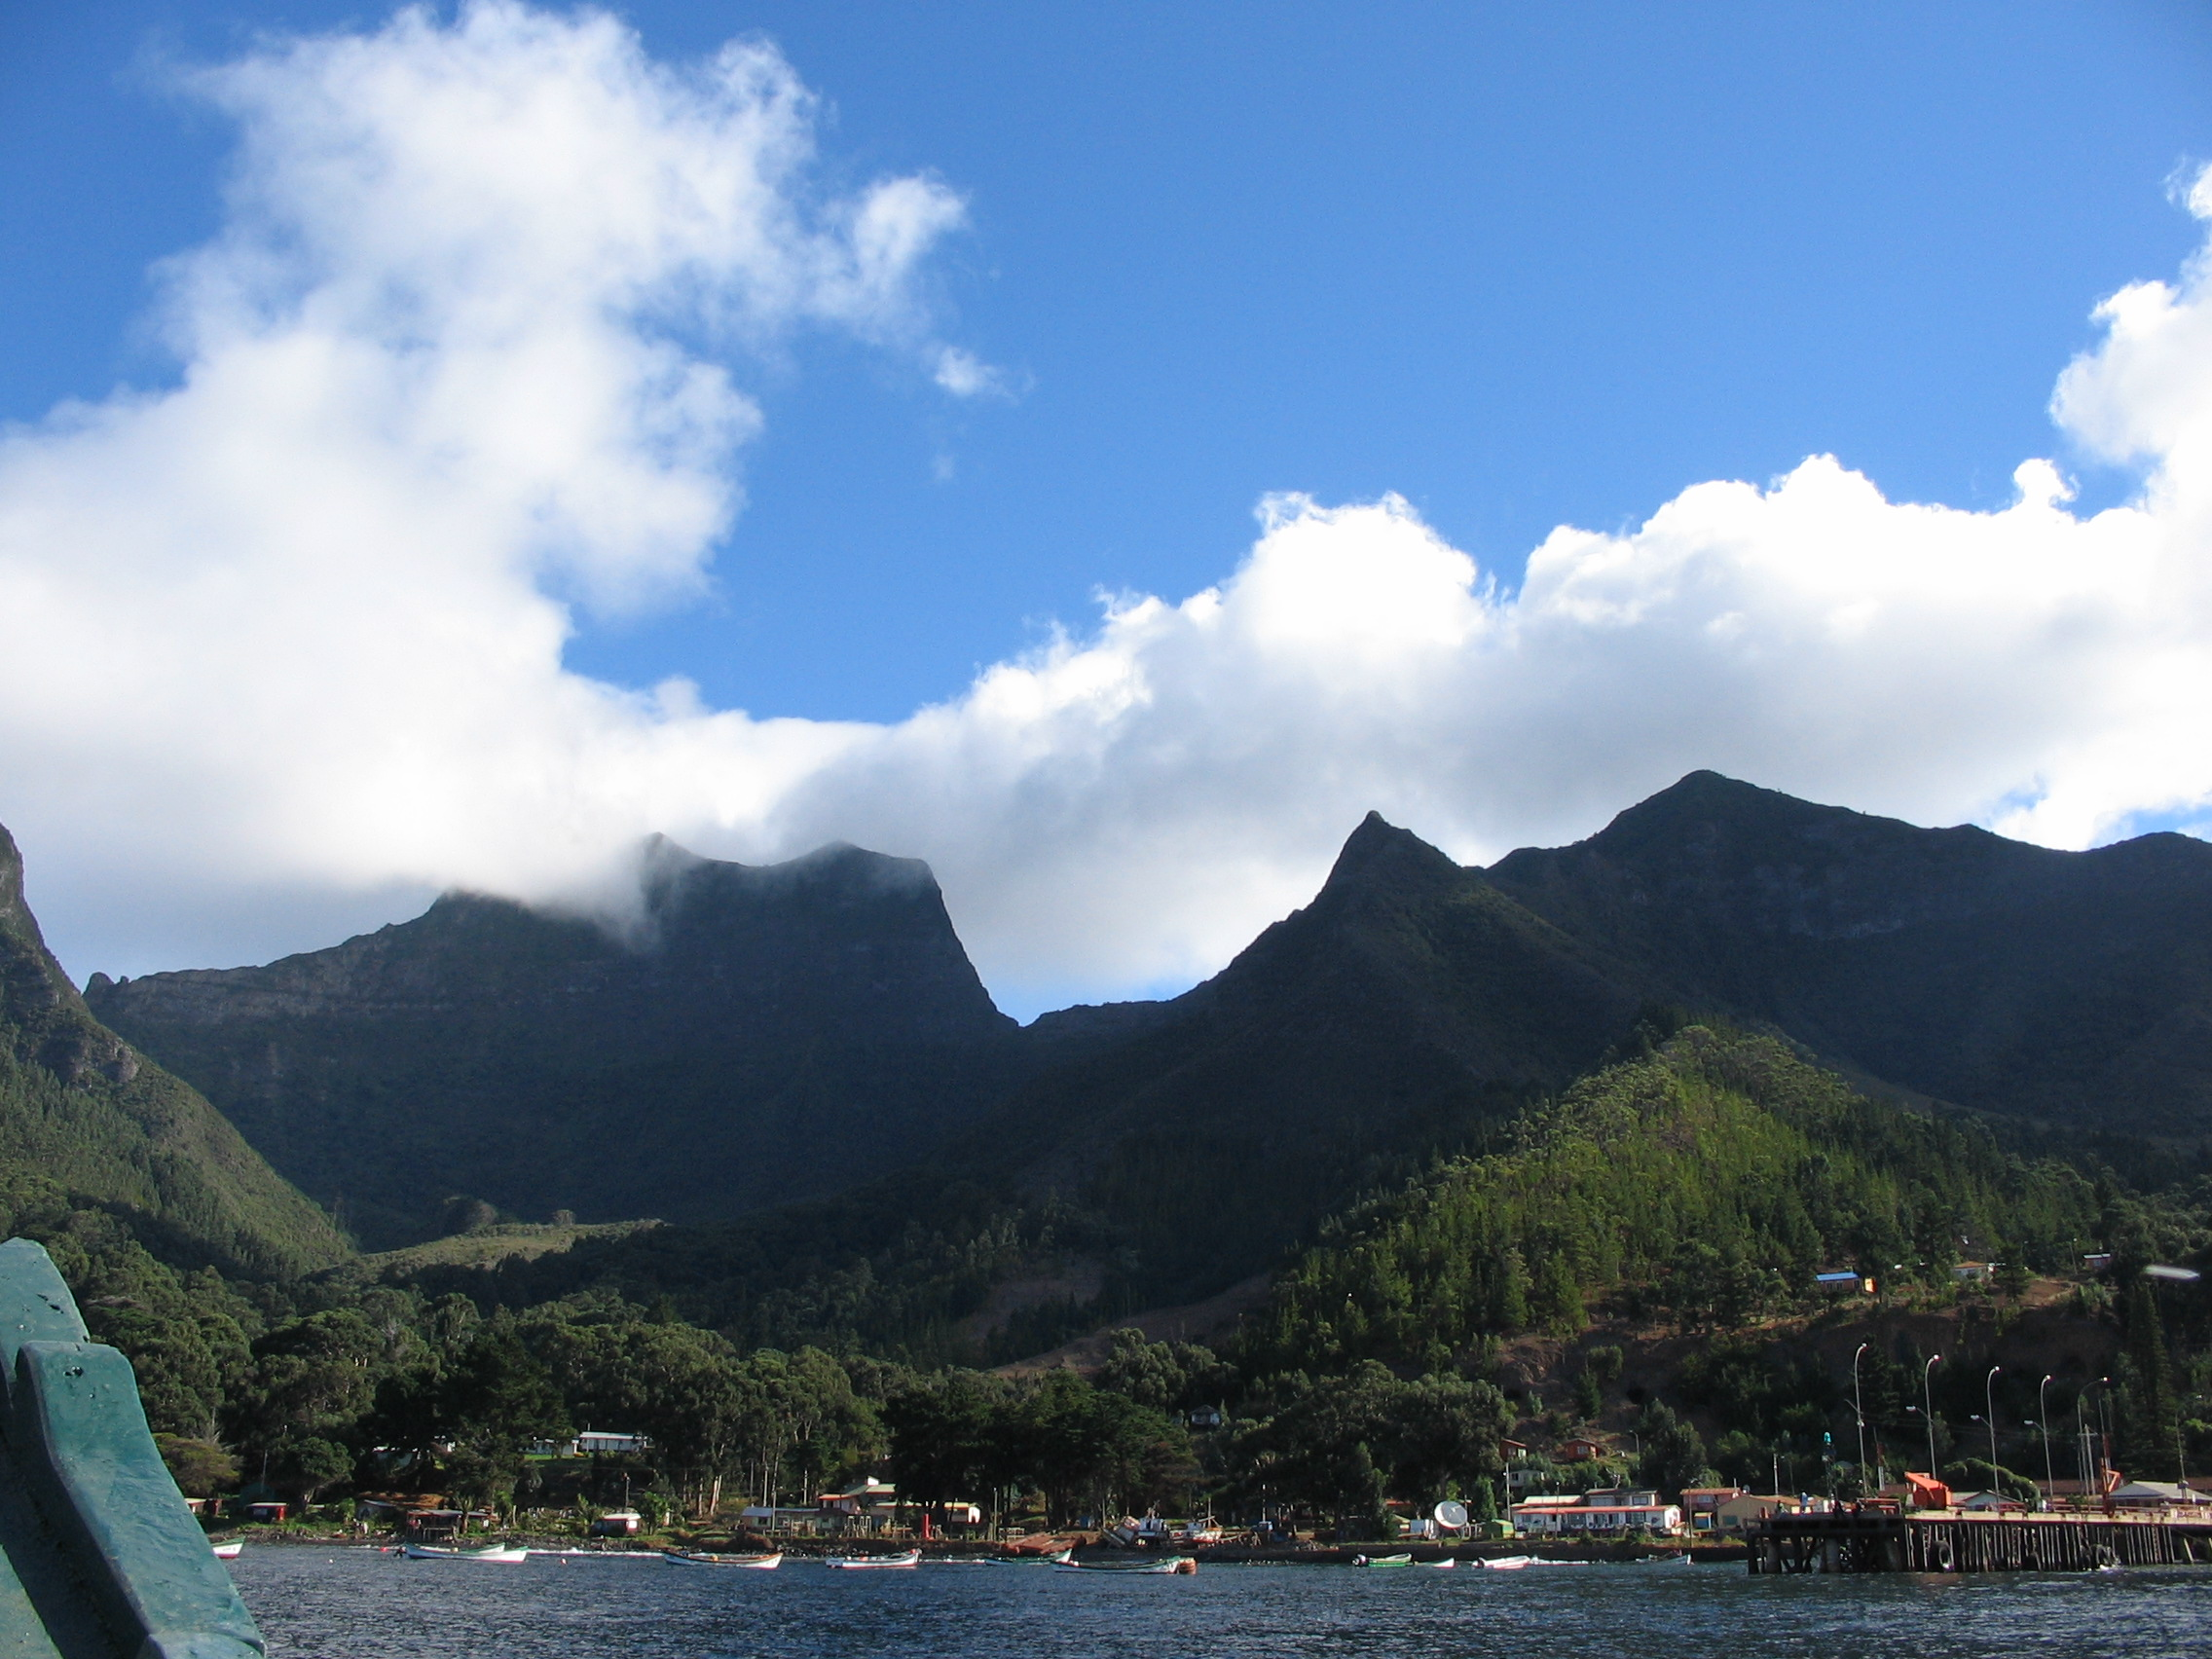 La isla Robinson Crusoe vista desde un bote. Imagen de Wikimedia Commons.